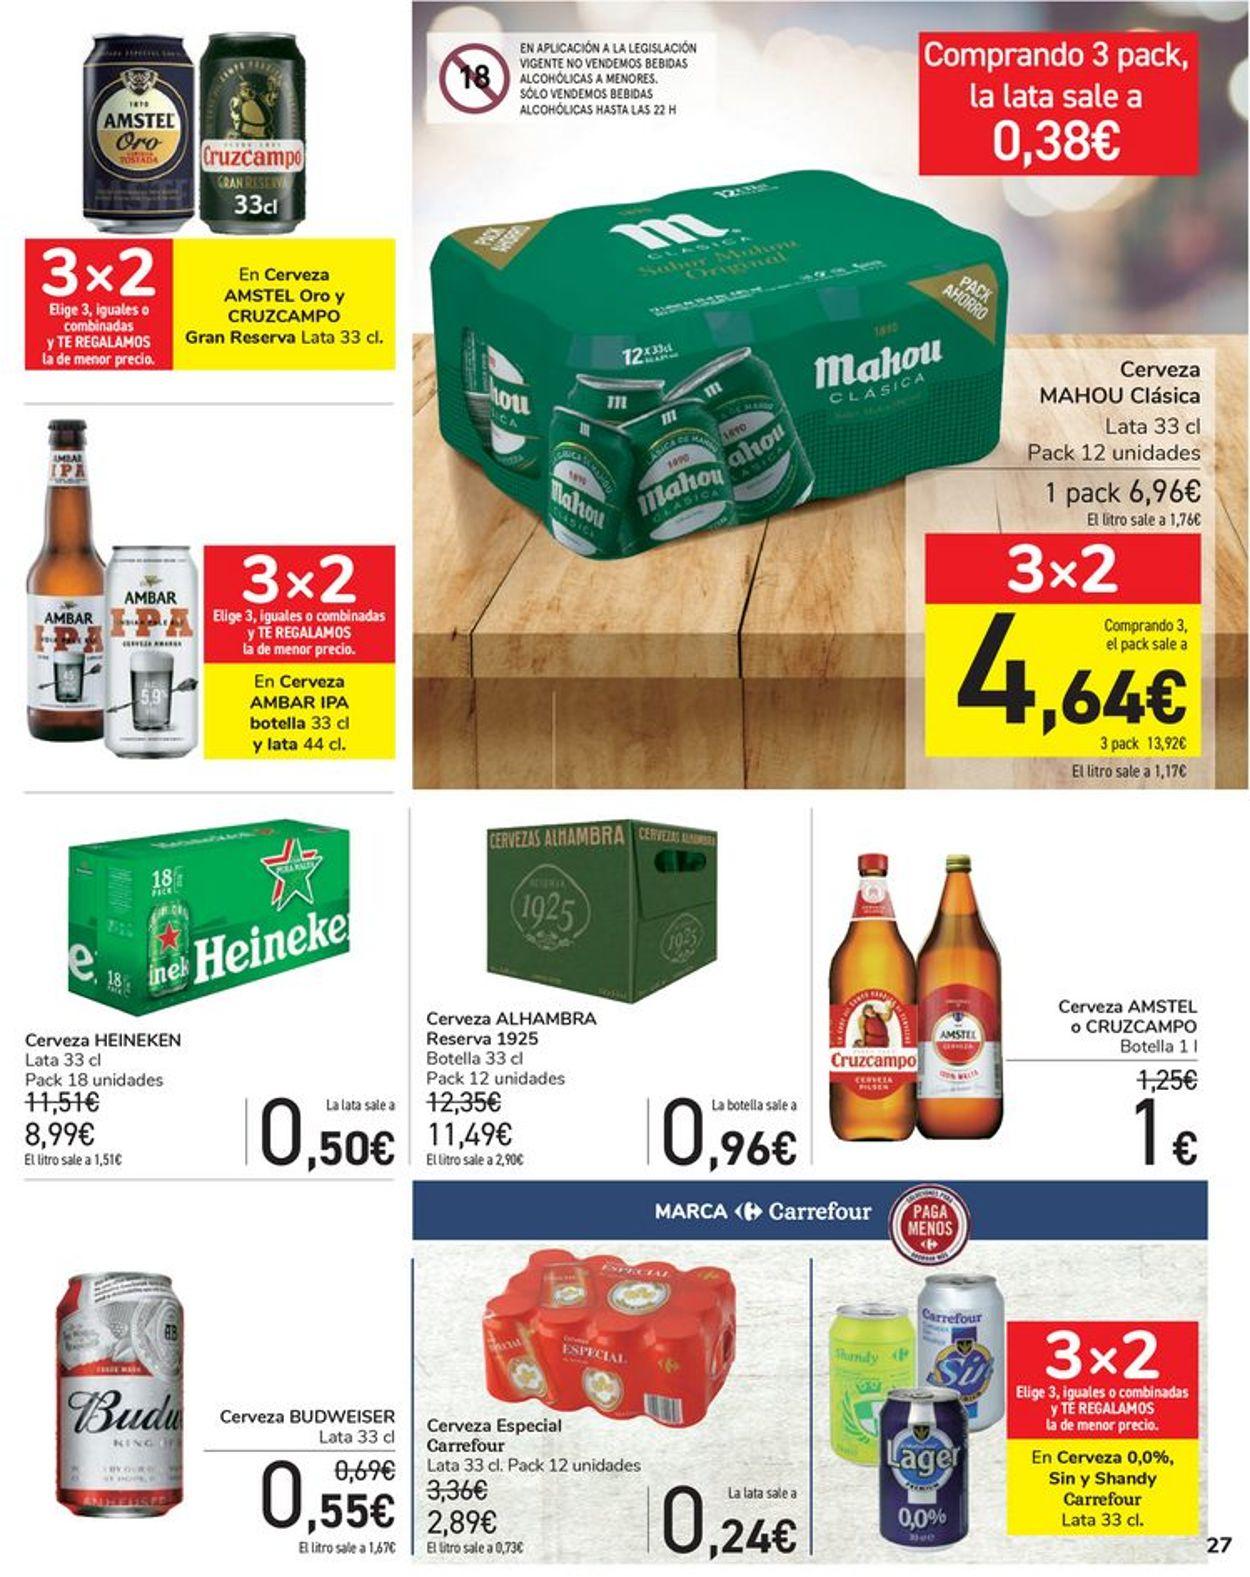 Carrefour Folleto - 06.04-15.04.2021 (Página 27)